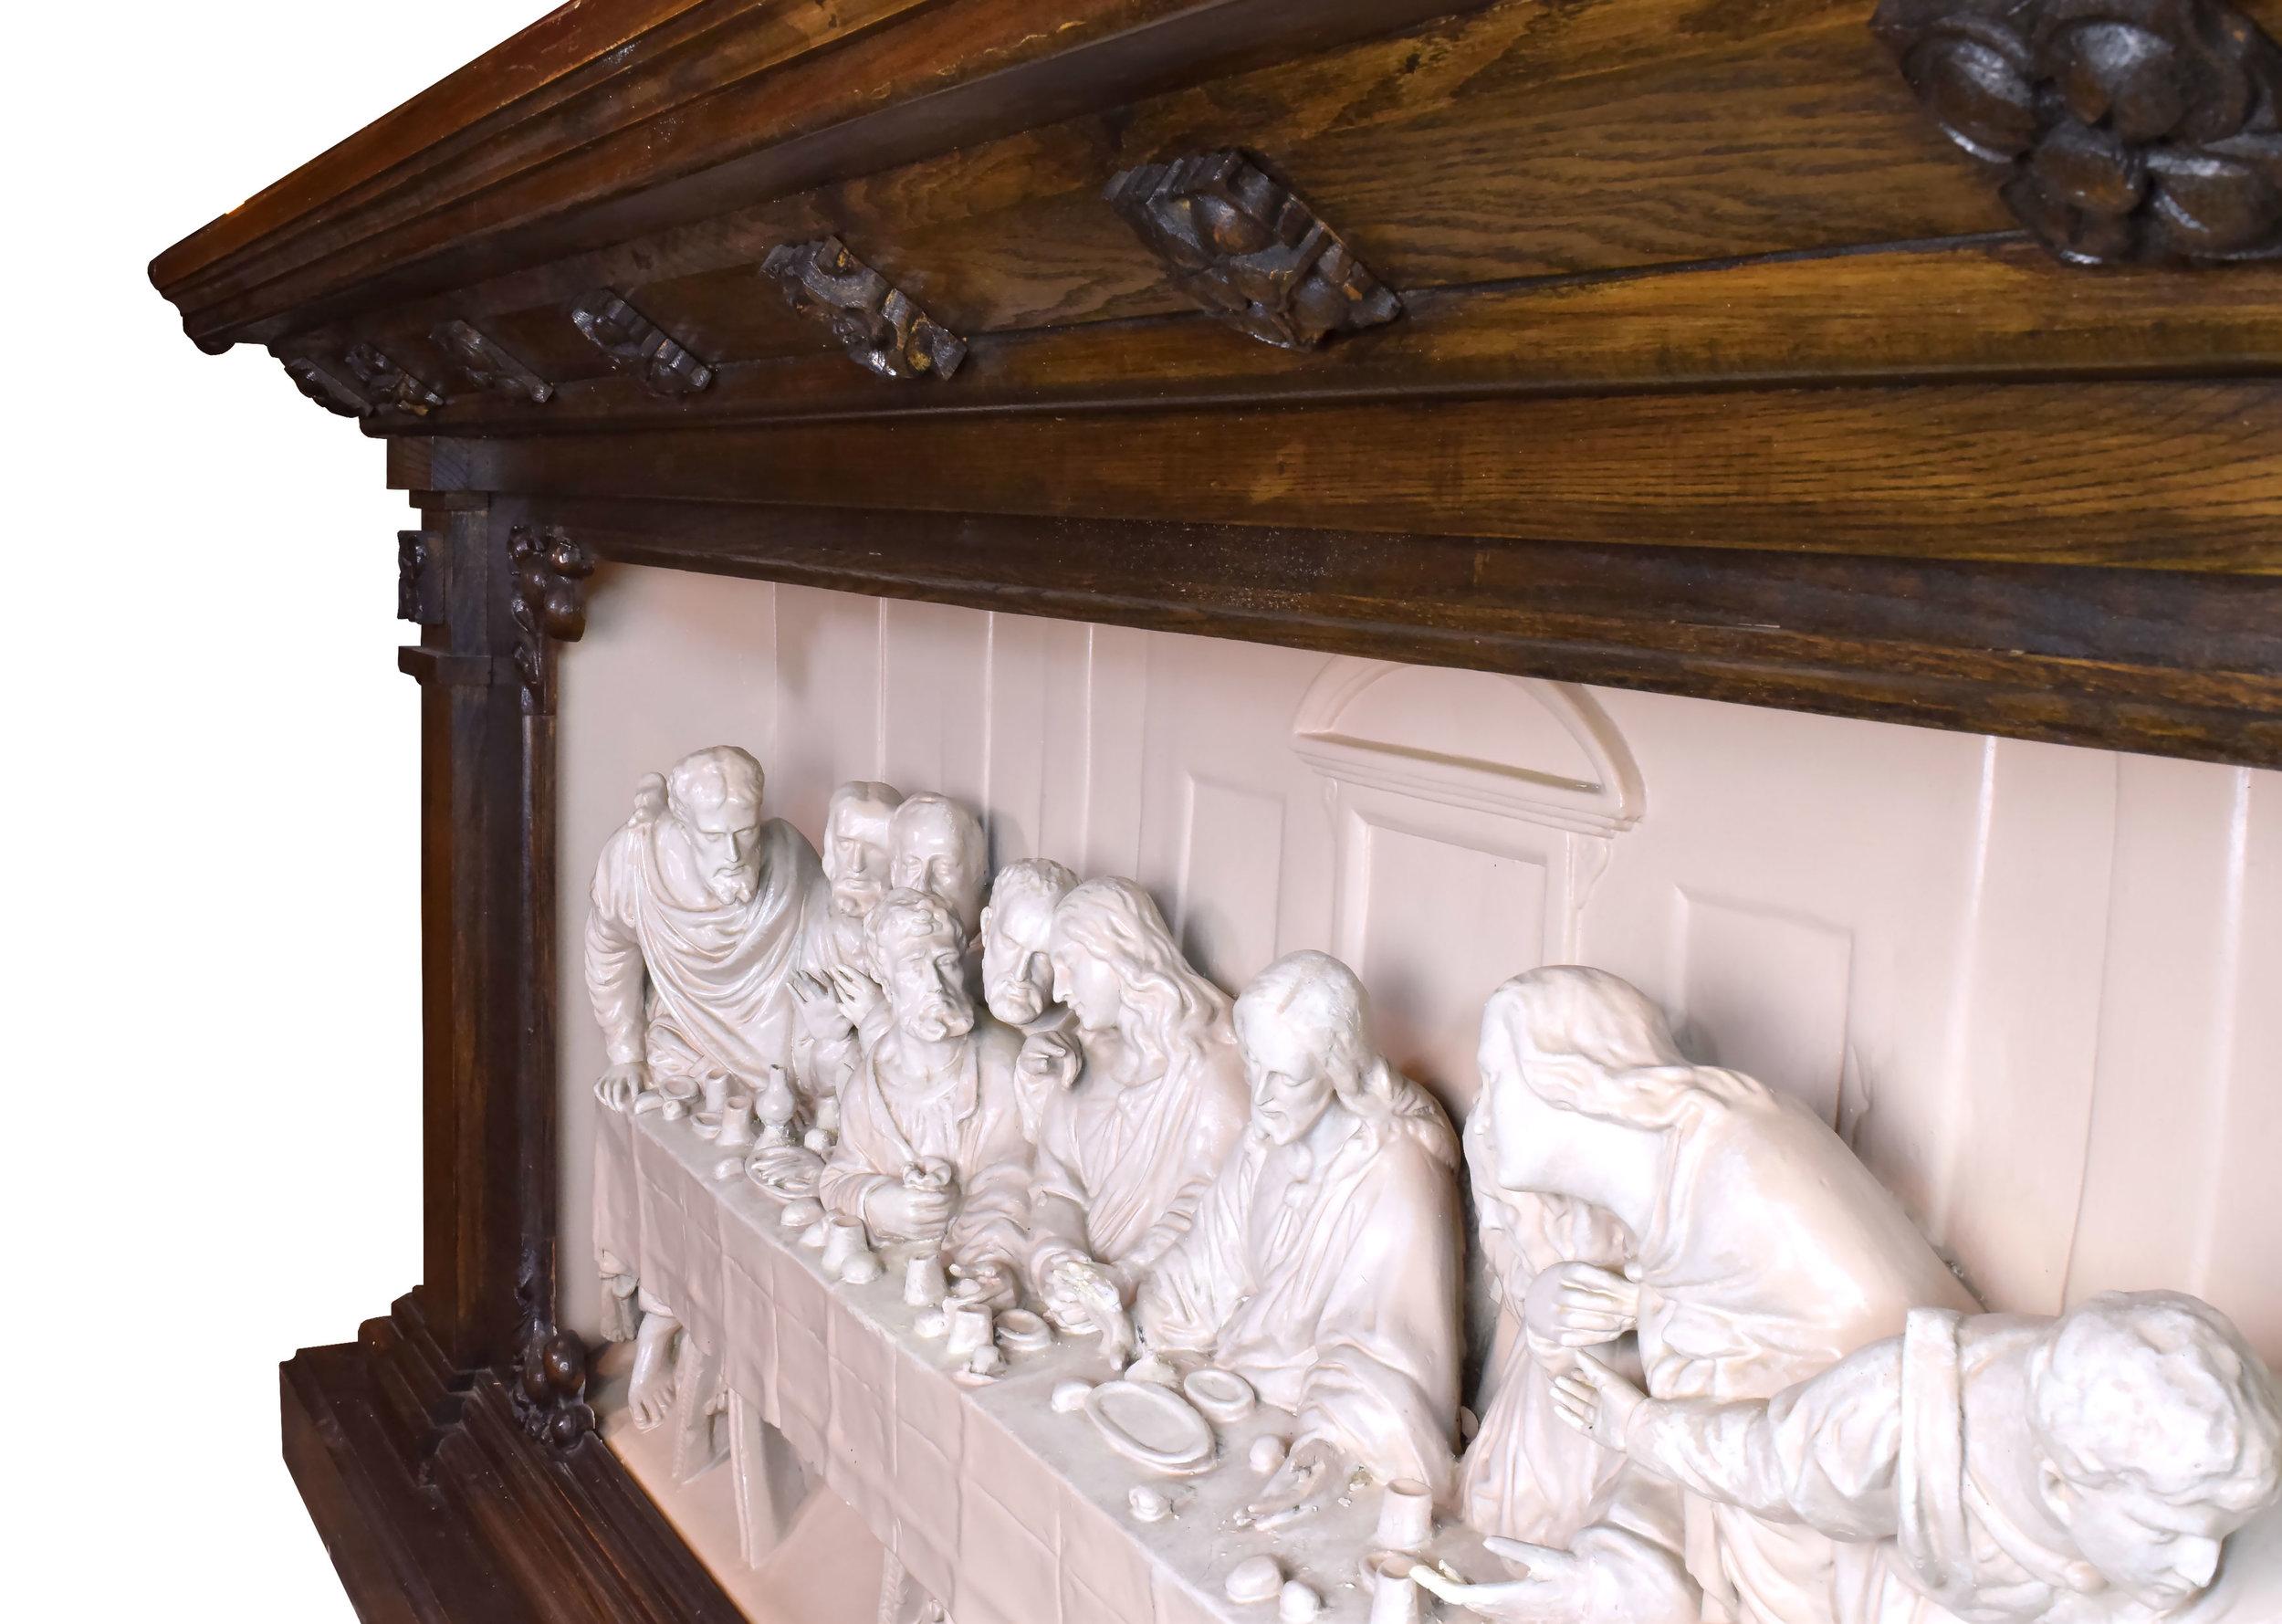 47229-wood-altar-last-supper-angle.jpg